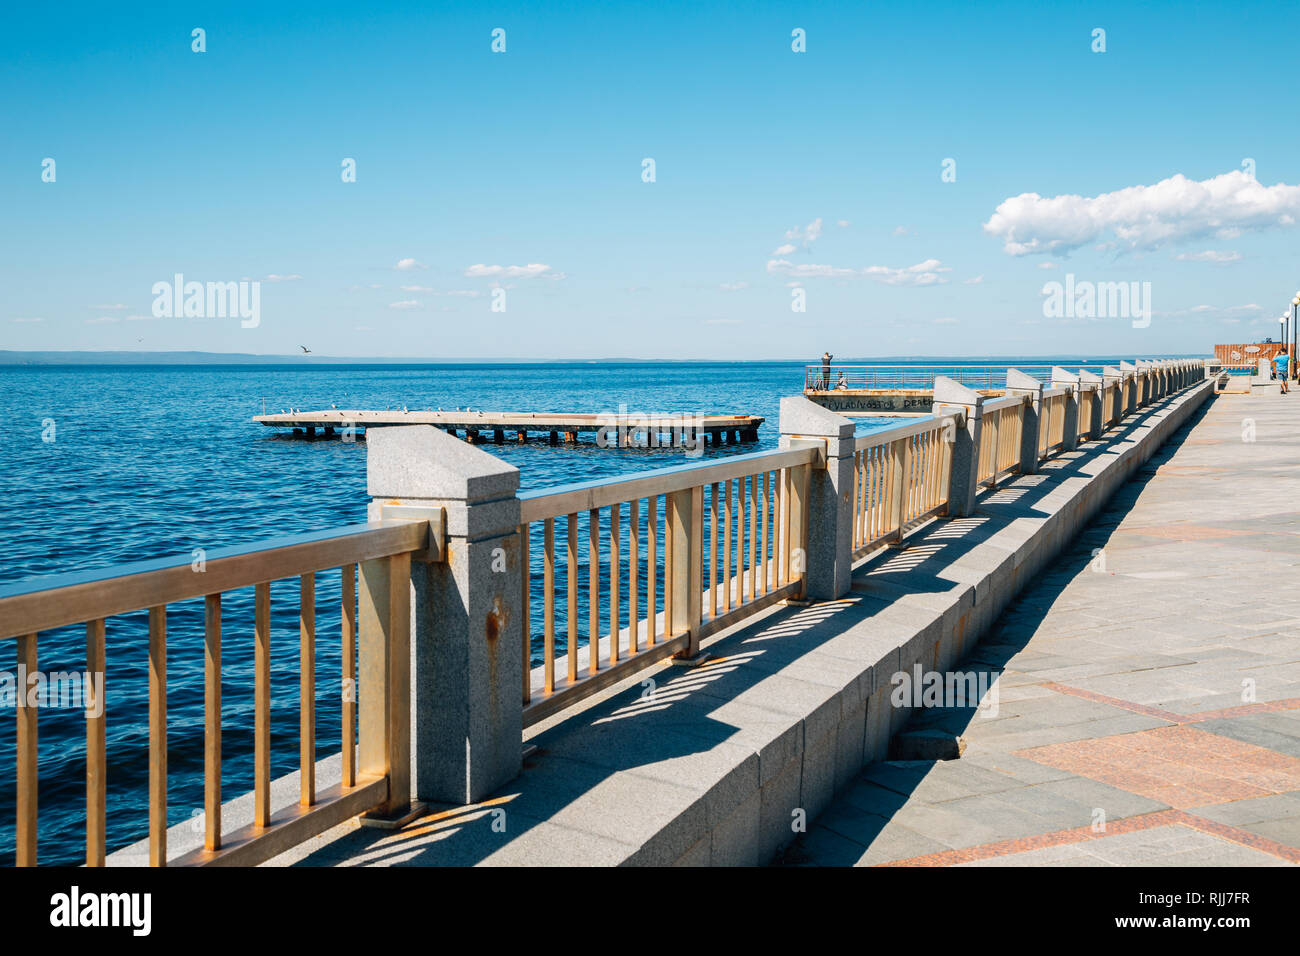 Seaside park in Vladivostok, Russia - Stock Image